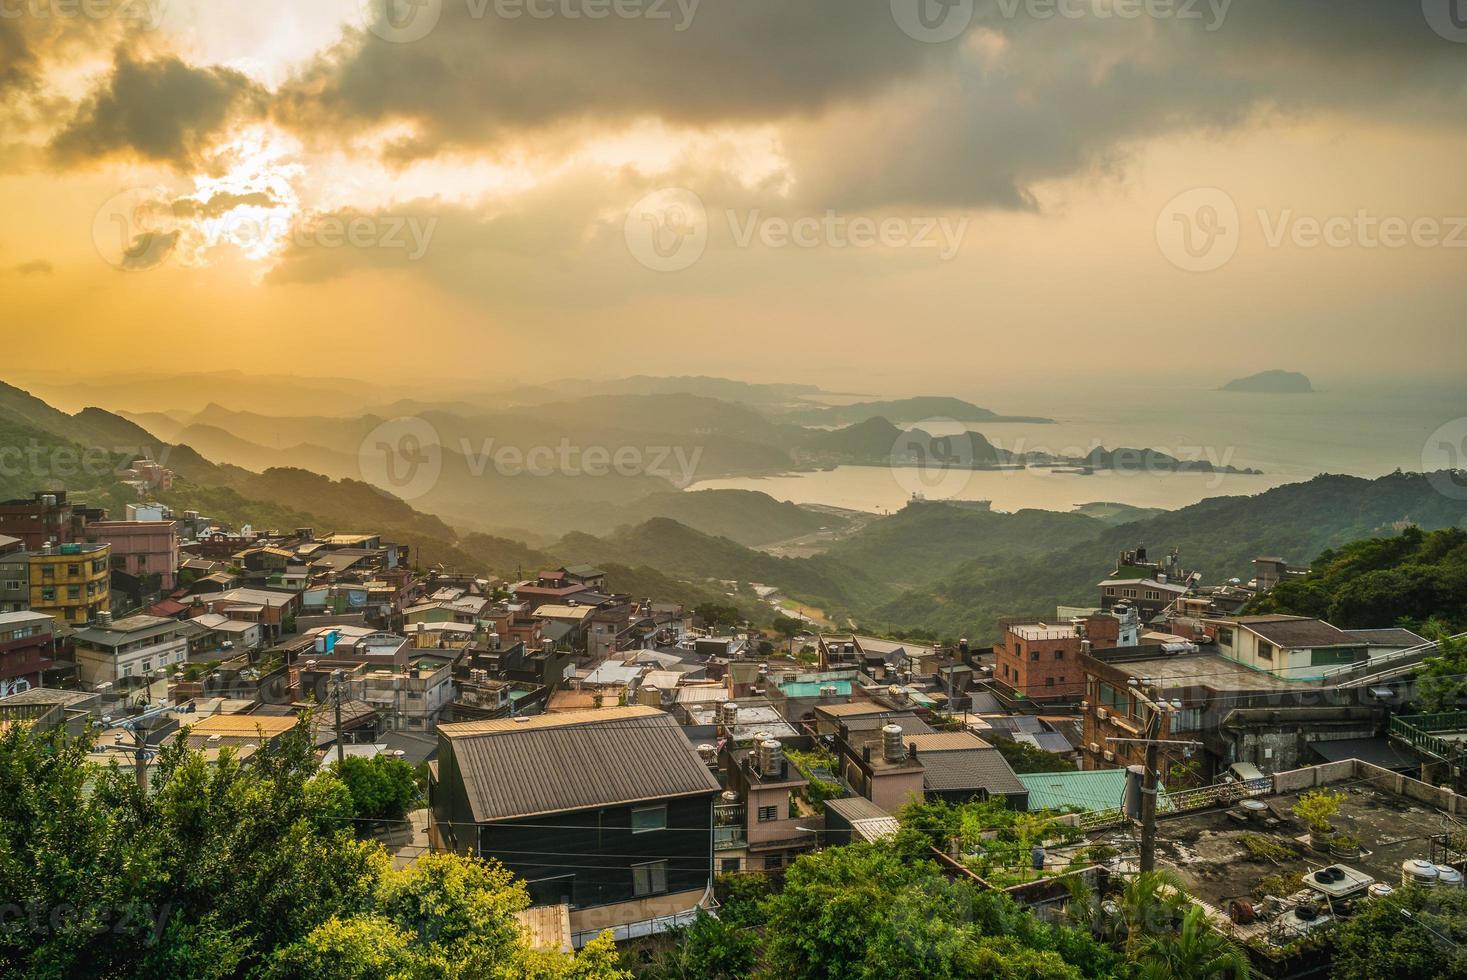 Scenery of Jiufen village in Taipei, Taiwan at dusk photo